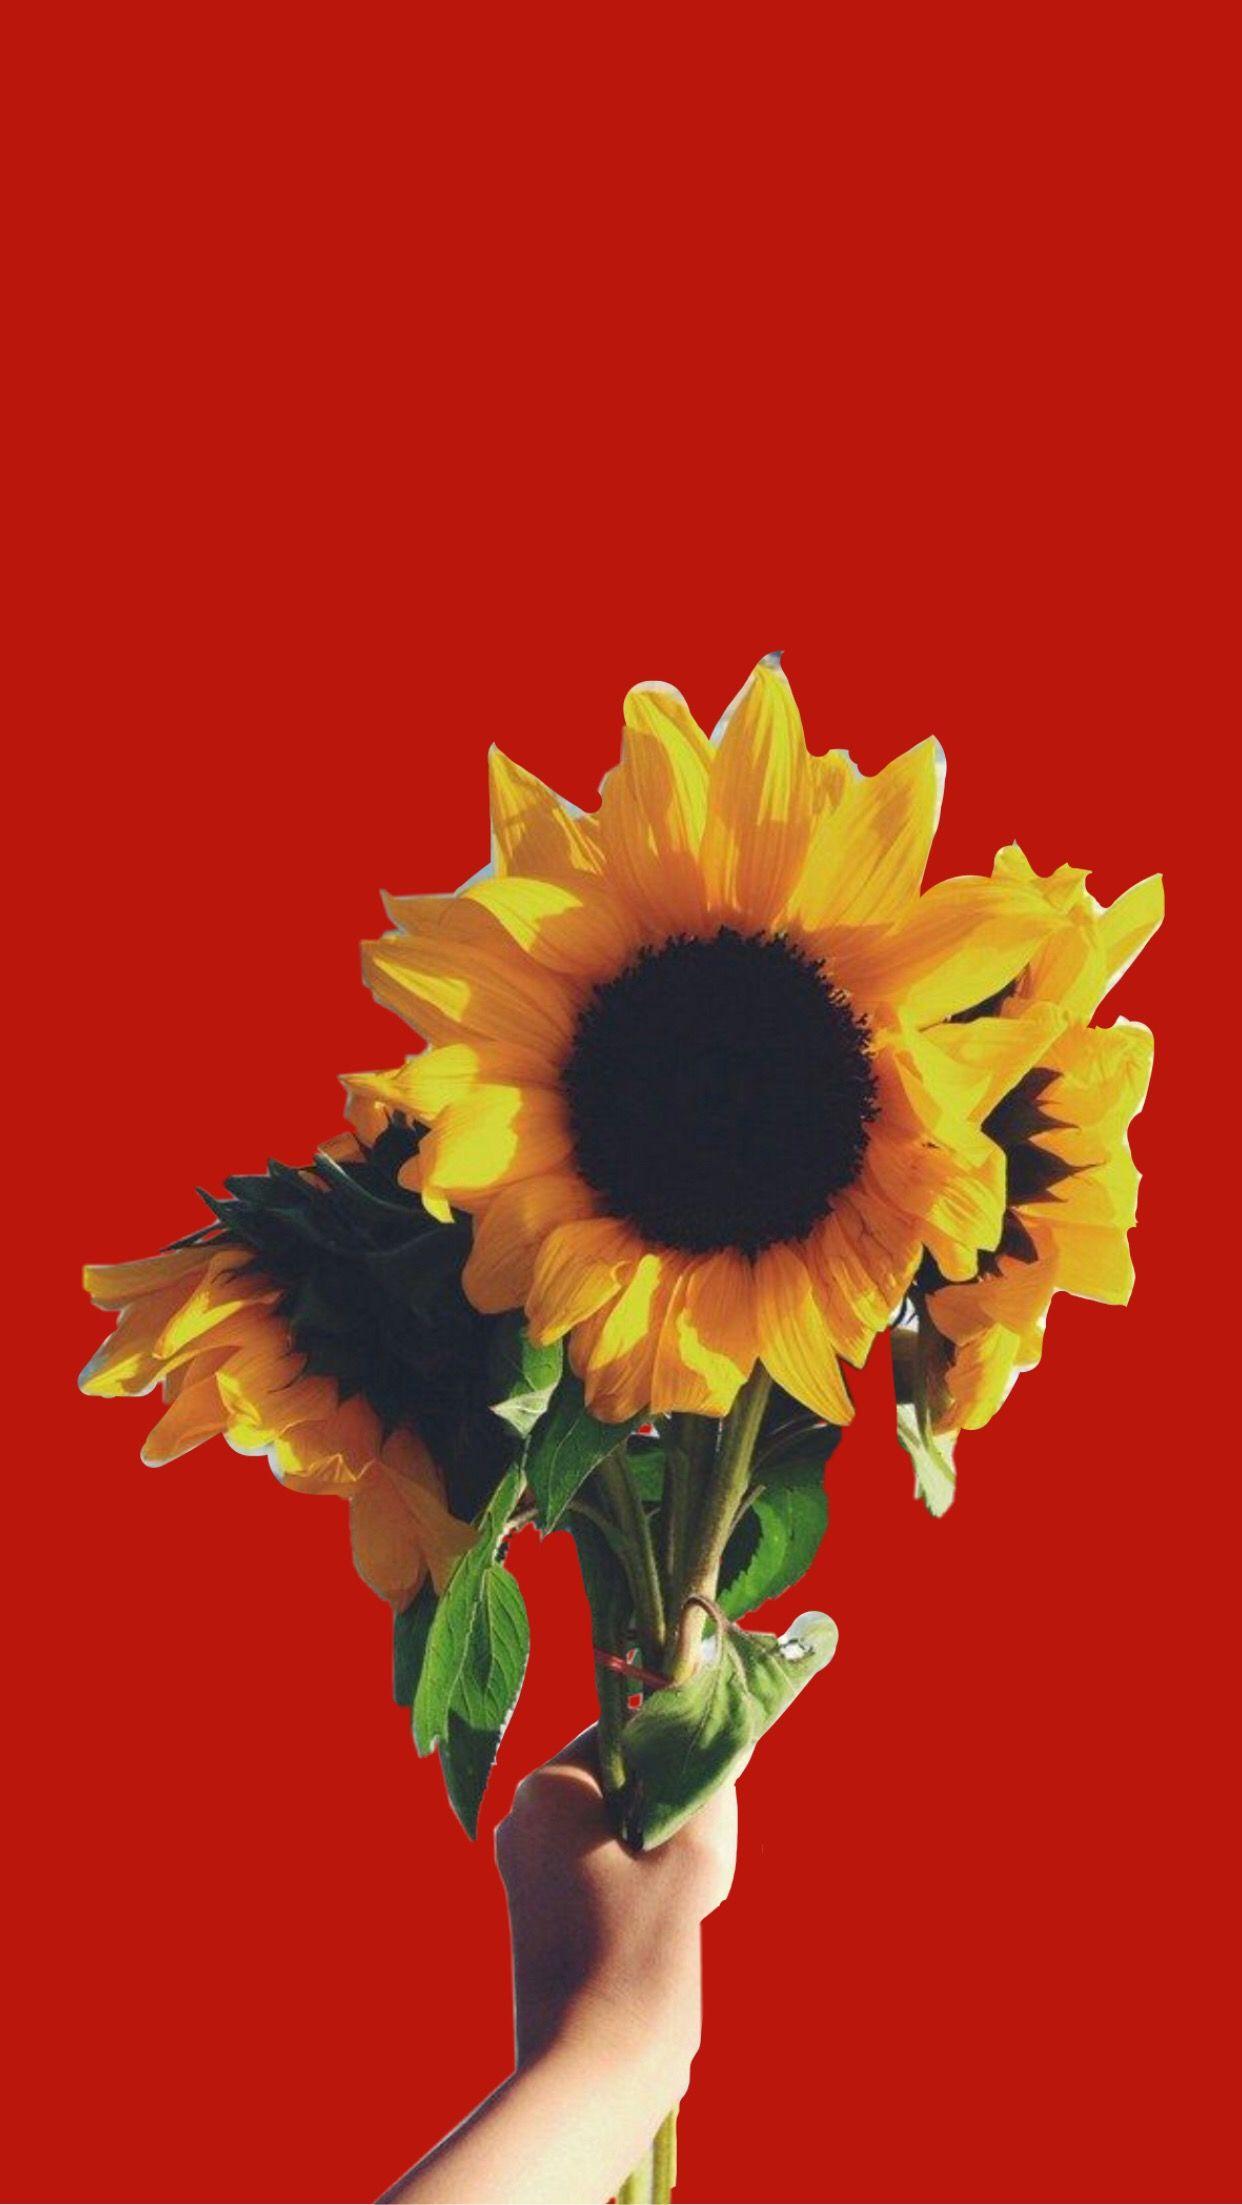 Red Lockscreen Wallpaper Background Sunflower Aesthetic Sunflower Wallpaper Lock Screen Backgrounds Sunflower Iphone Wallpaper